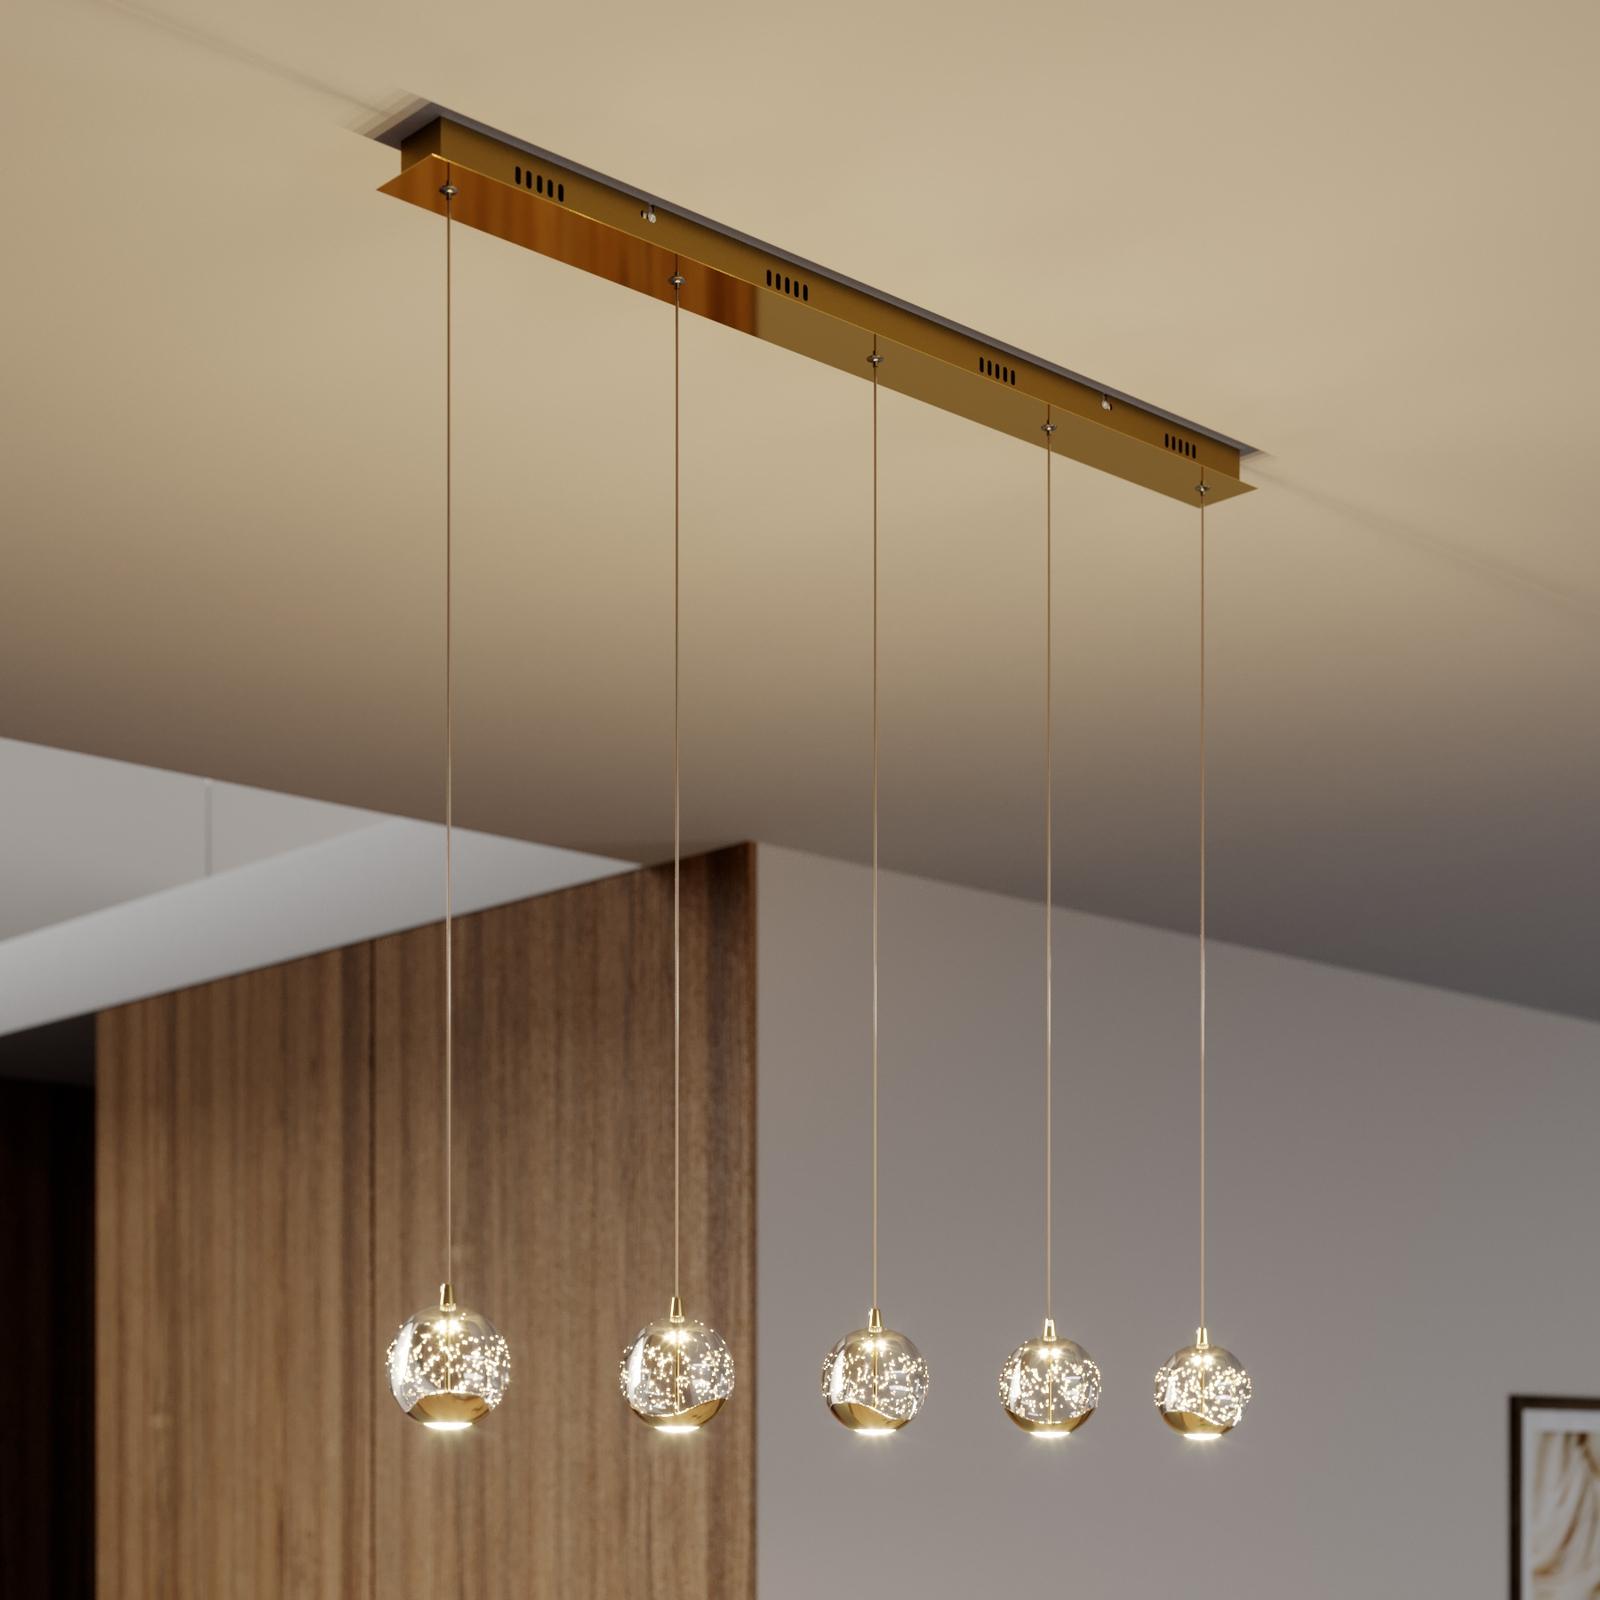 LED-pendellampe Hayley, 5 lyskilder, lang, gull